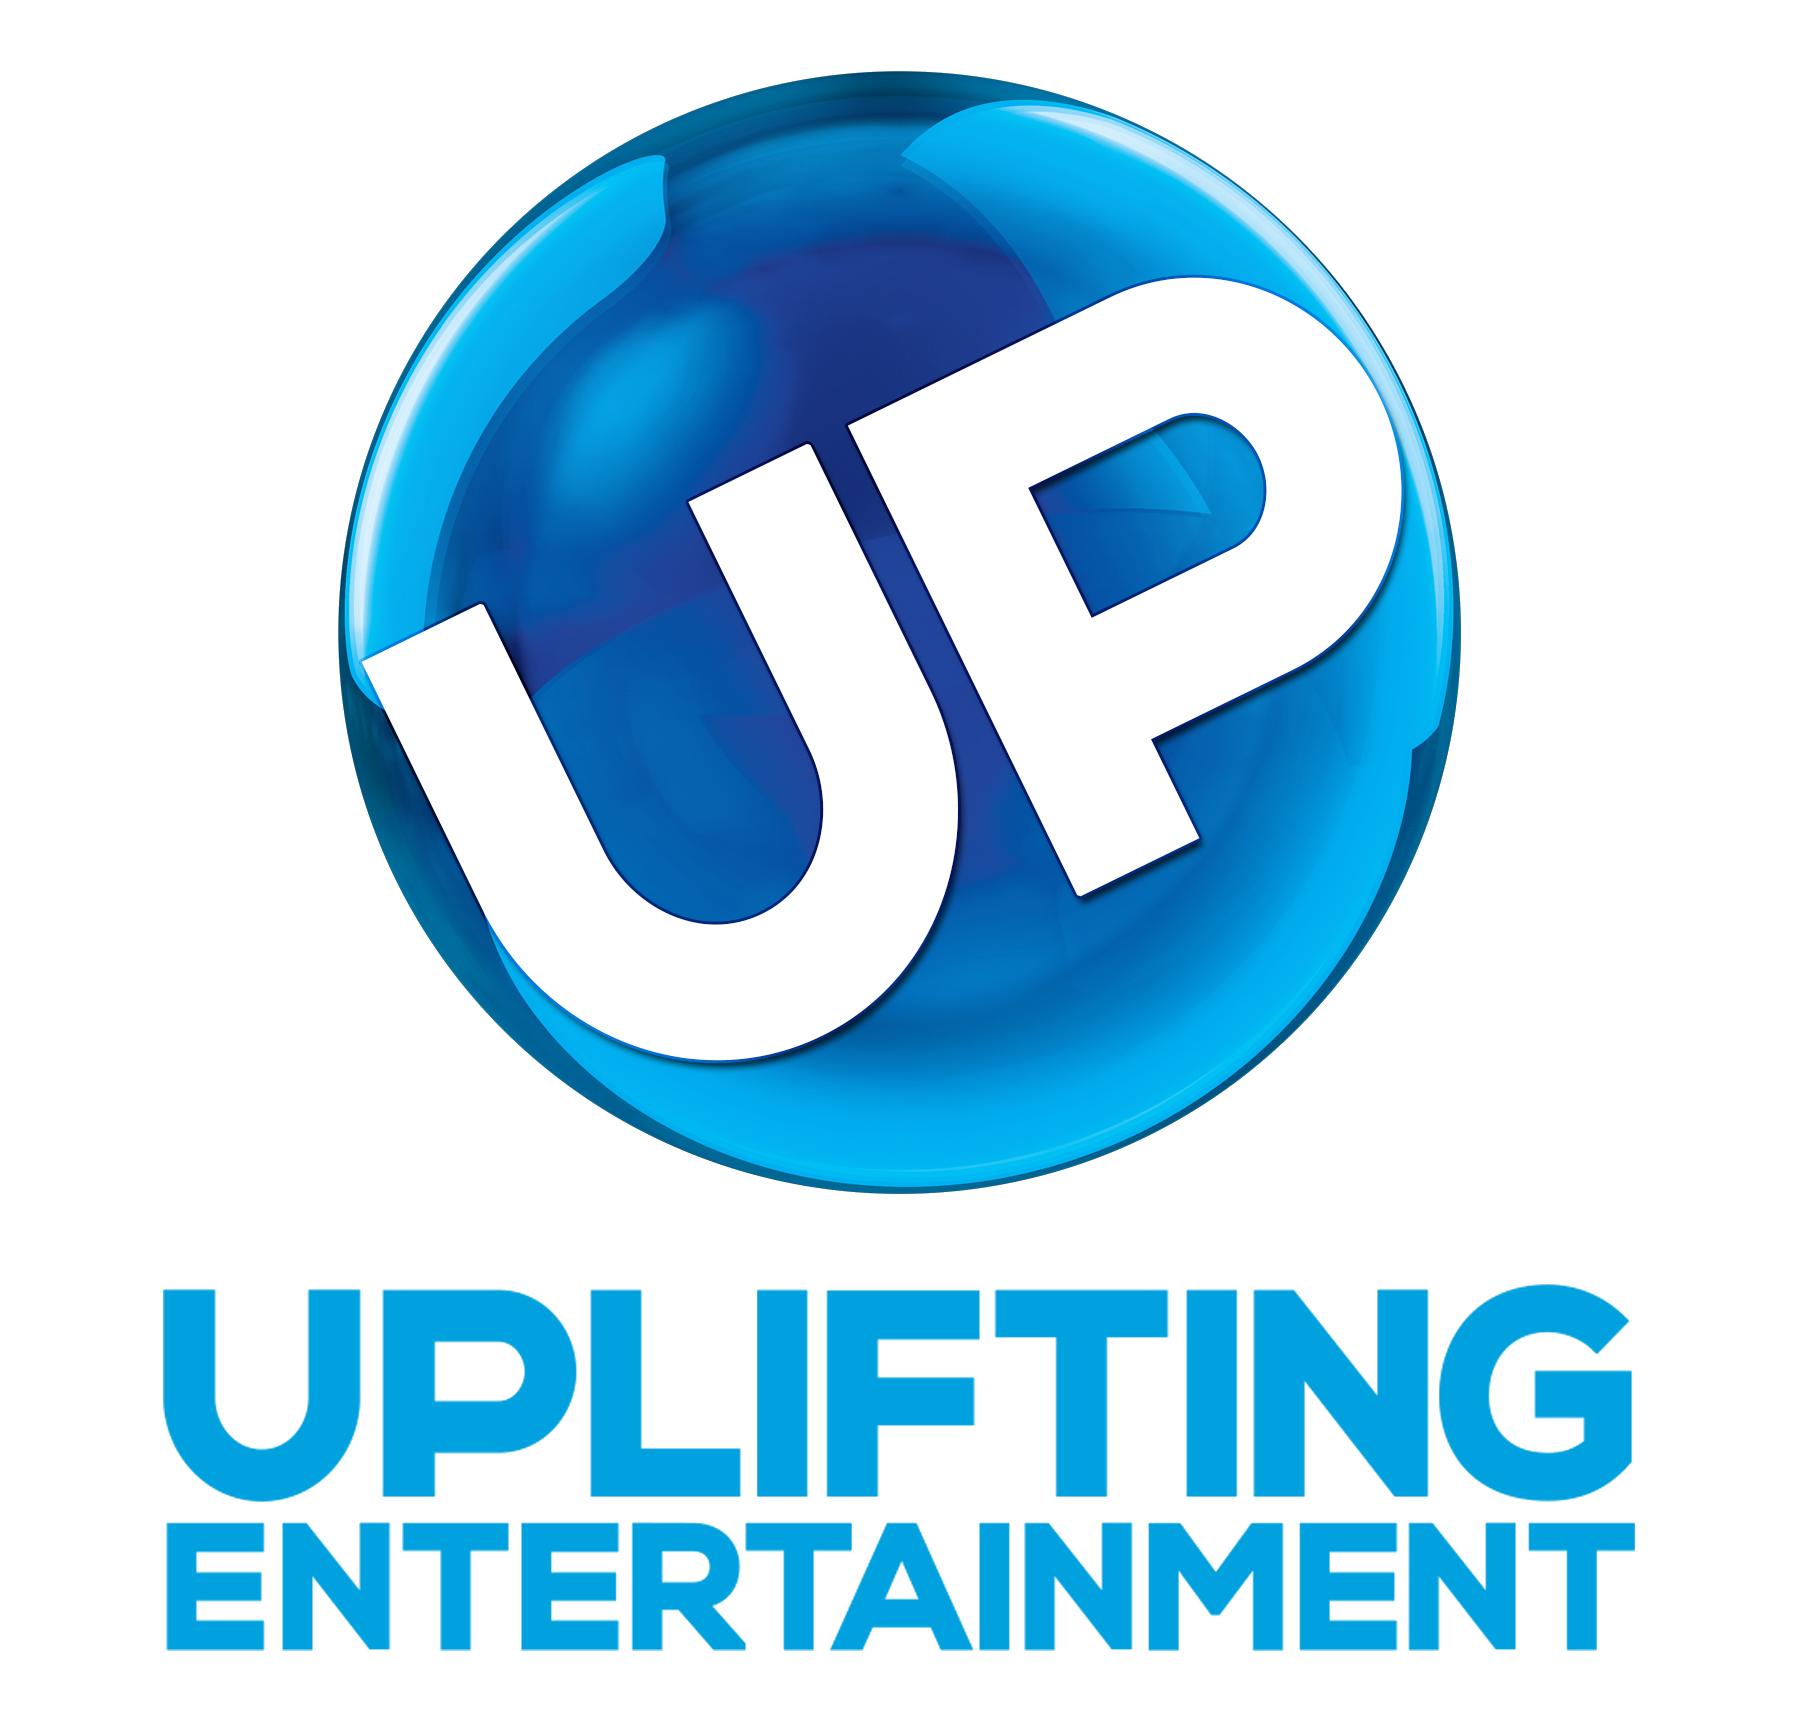 Uplifting Entertainment